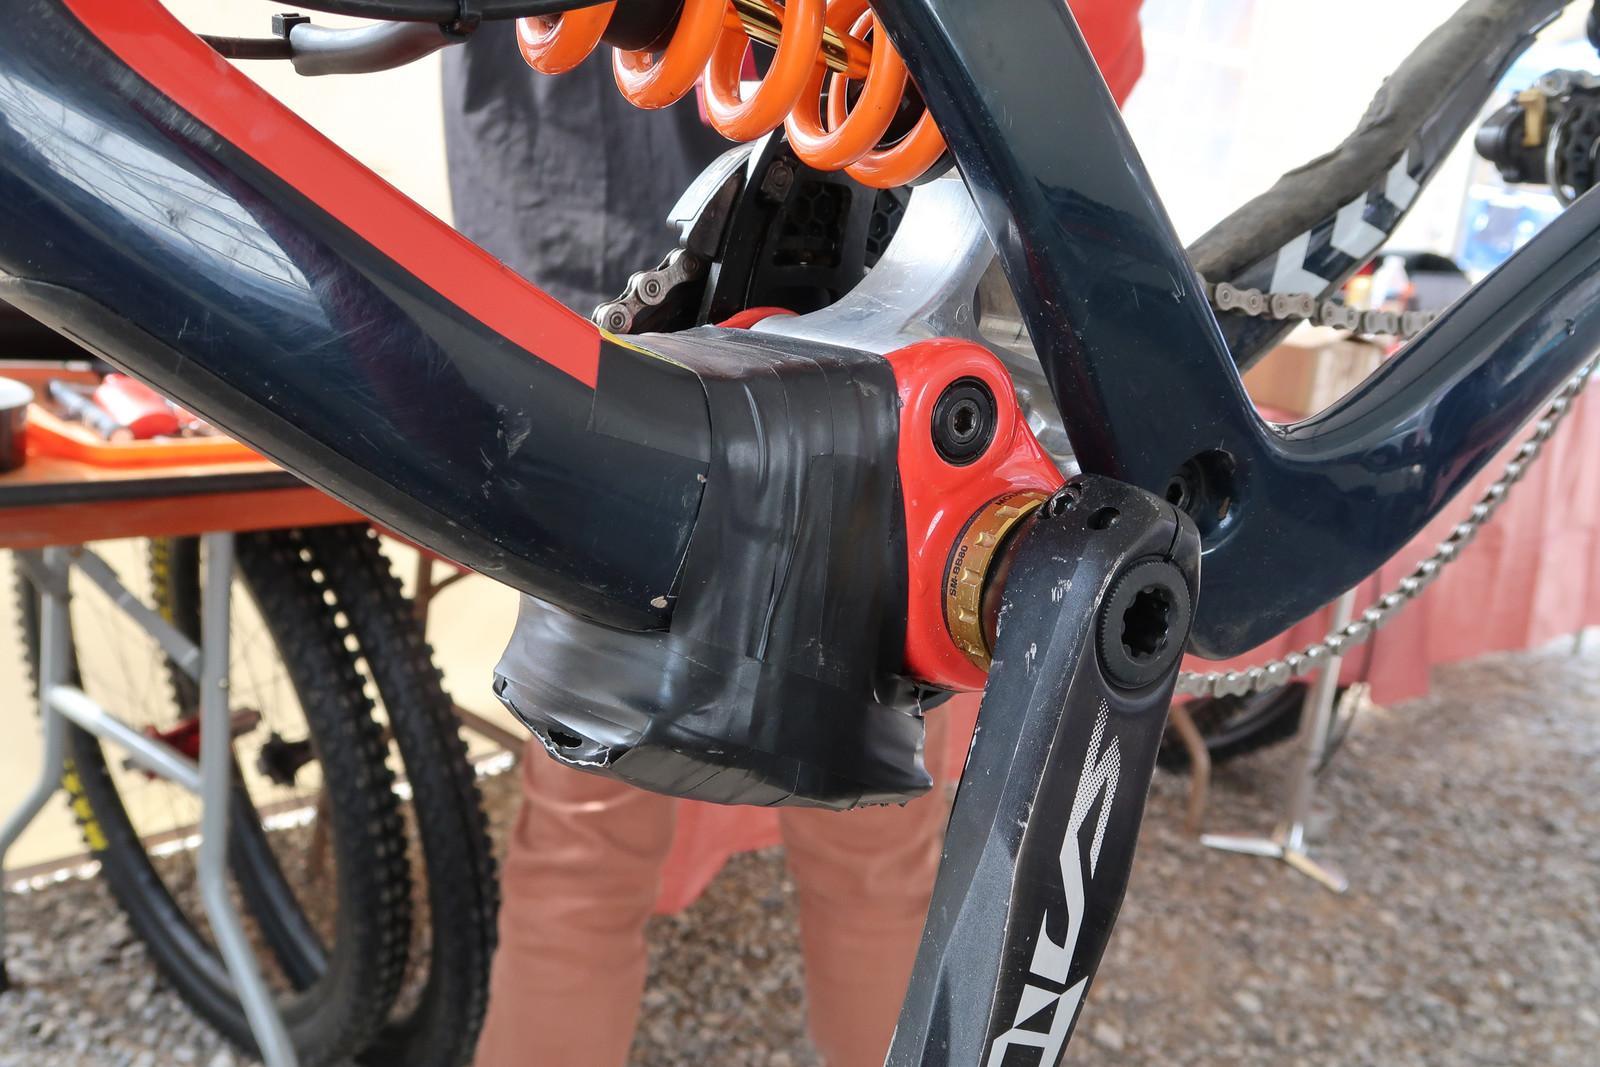 PIT BITS - Windrock Pro GRT - Santa Cruz Syndicate - PIT BITS - Windrock Pro GRT - Mountain Biking Pictures - Vital MTB